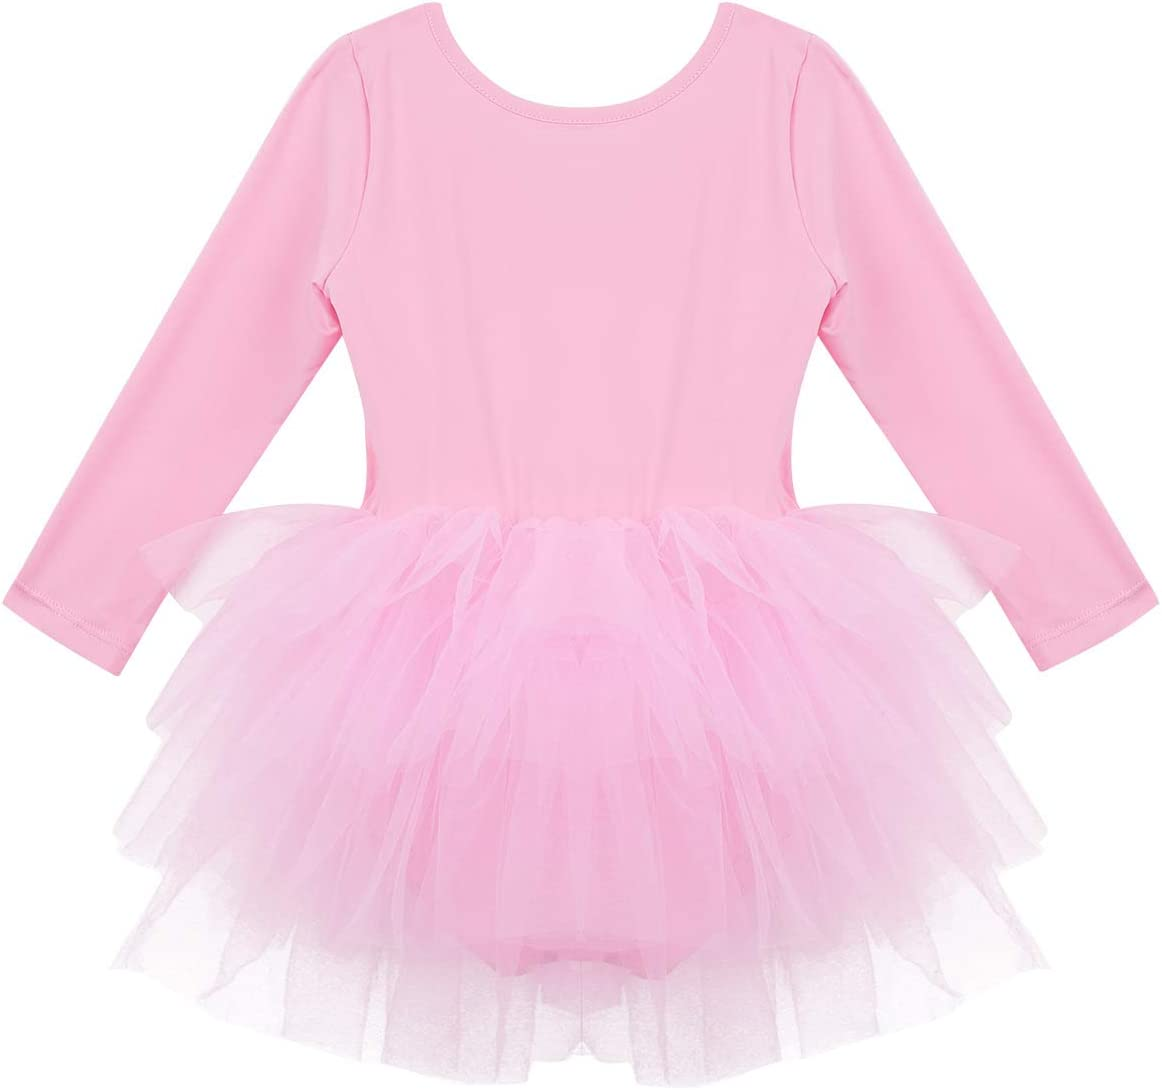 MSemis Kids Toddlers Girls Long Sleeves Gymnastics Ballet Tutu Dress Leotard Ballerina Dance Dress Jumpsuit Dancewear